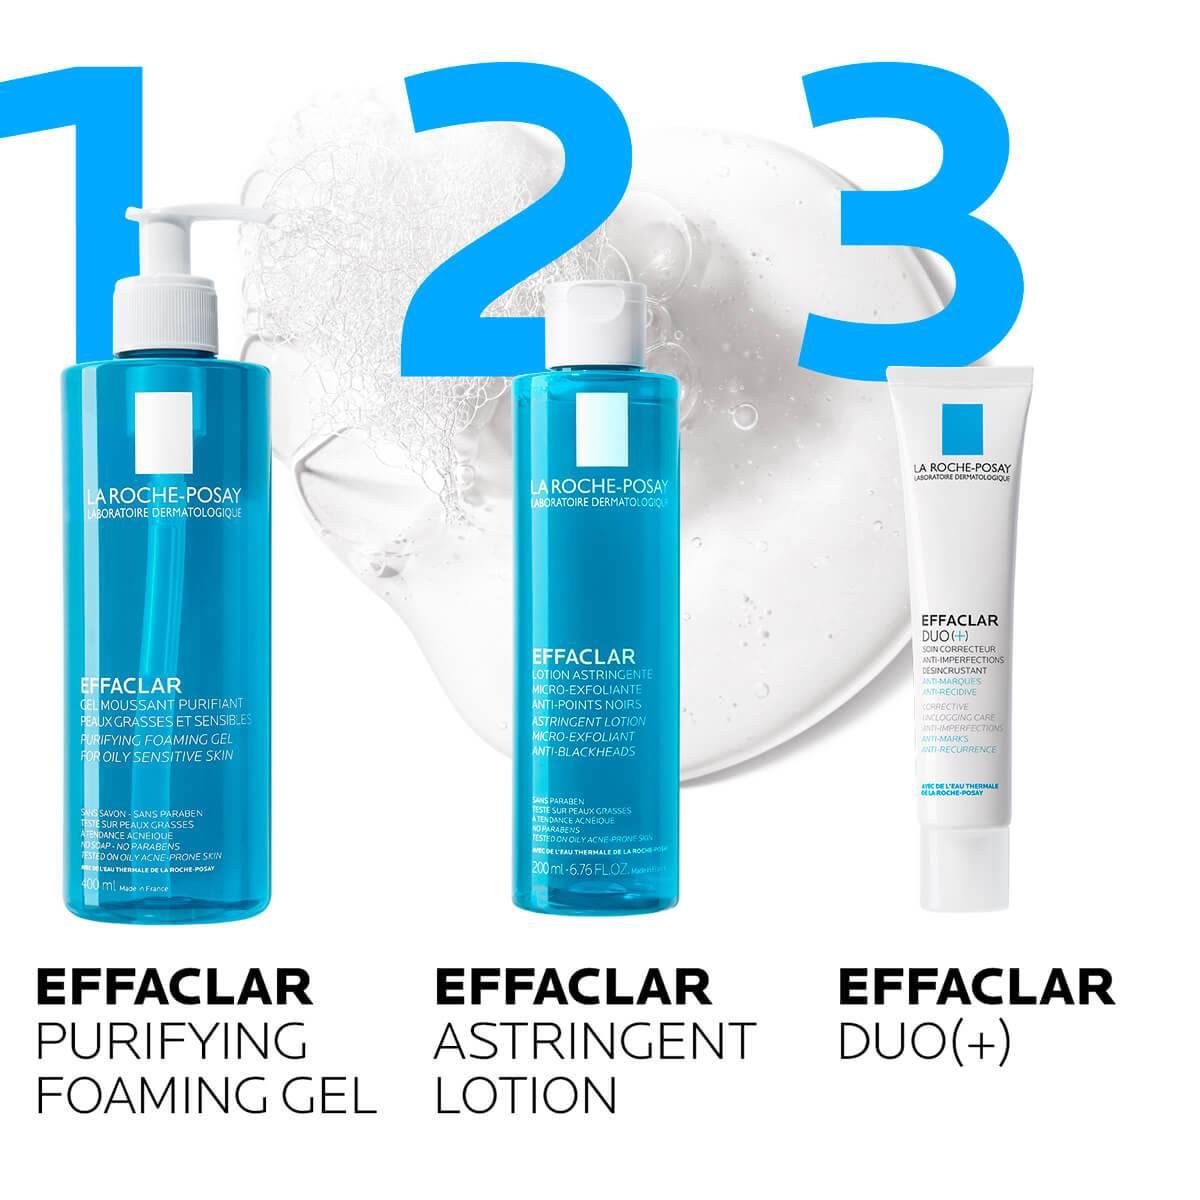 La Roche Posay ProductPage Acne Effaclar Cleansing Foaming Gel 400ml routine